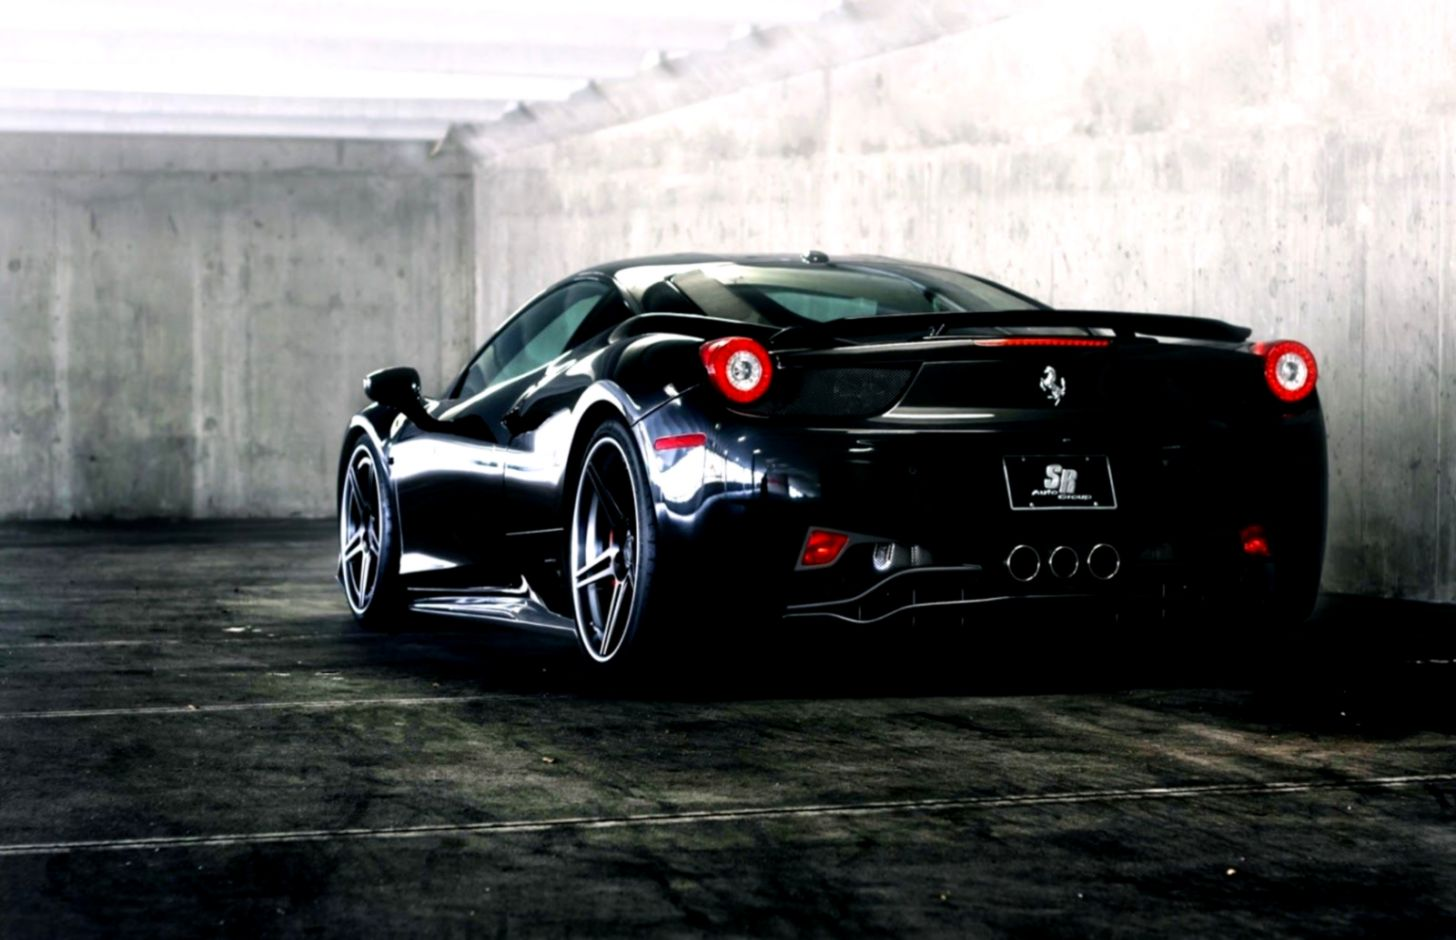 Wallpaper Android Ferrari: Ferrari 458 Italia Wallpaper Hd 1920X1080